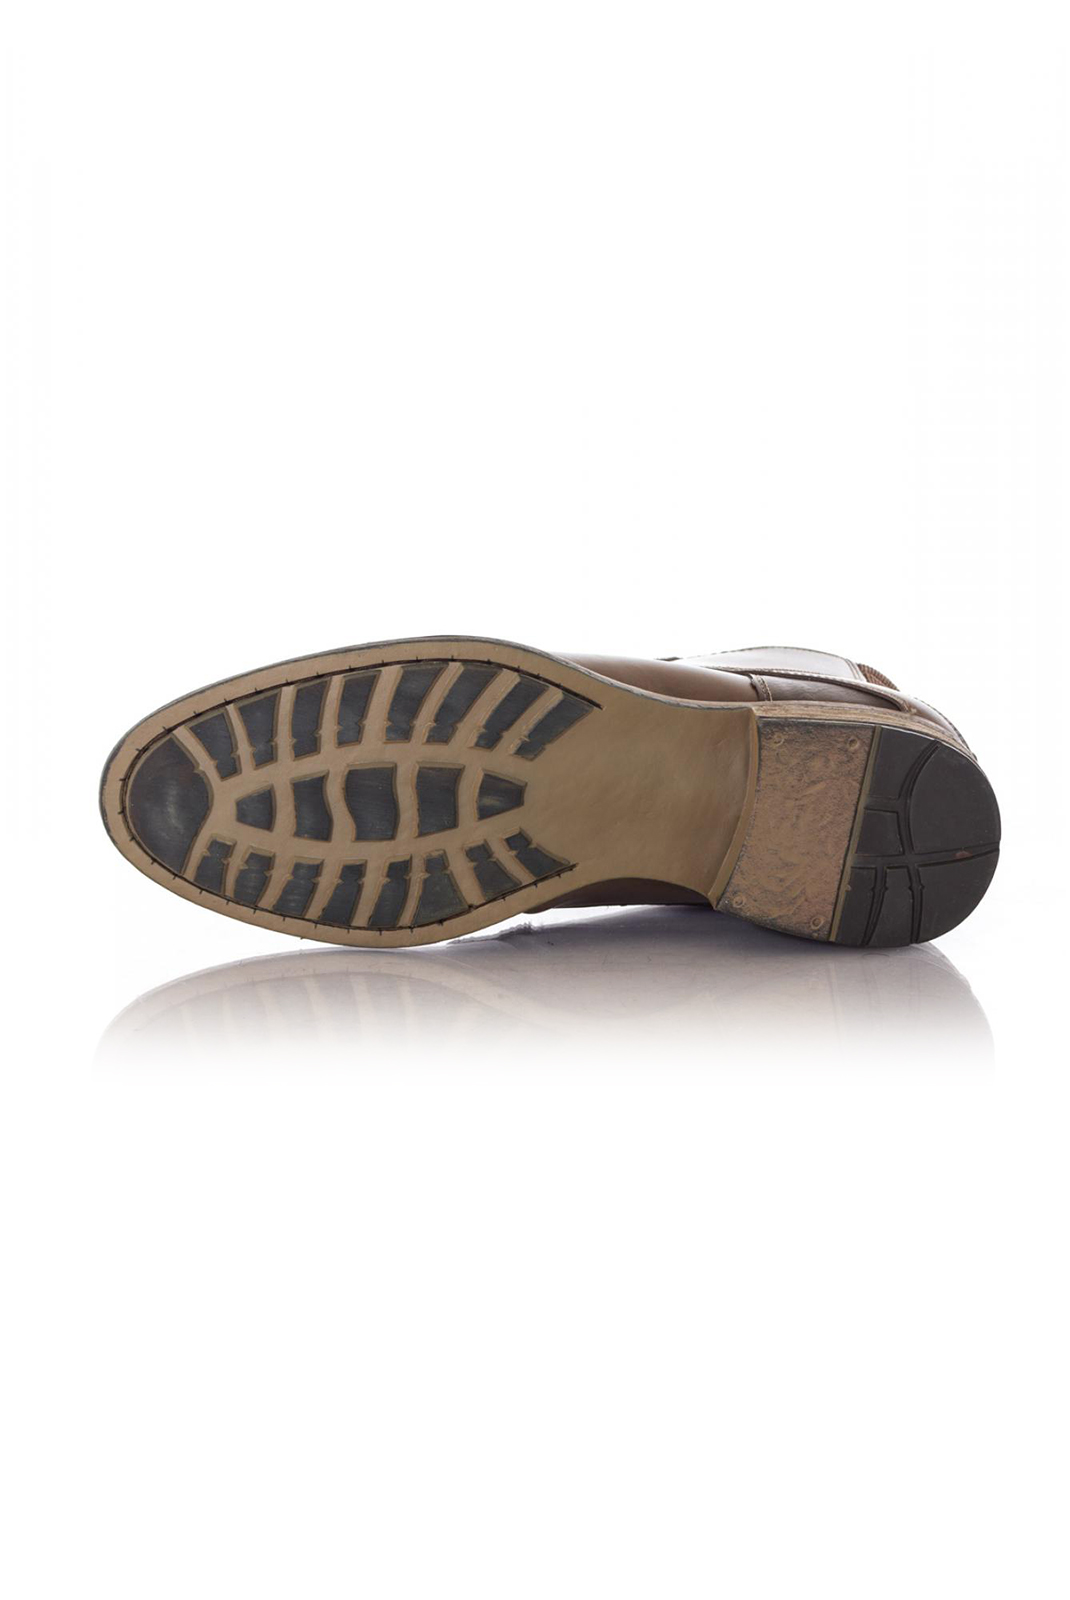 Chaussures   Redskins CAPS MARRON